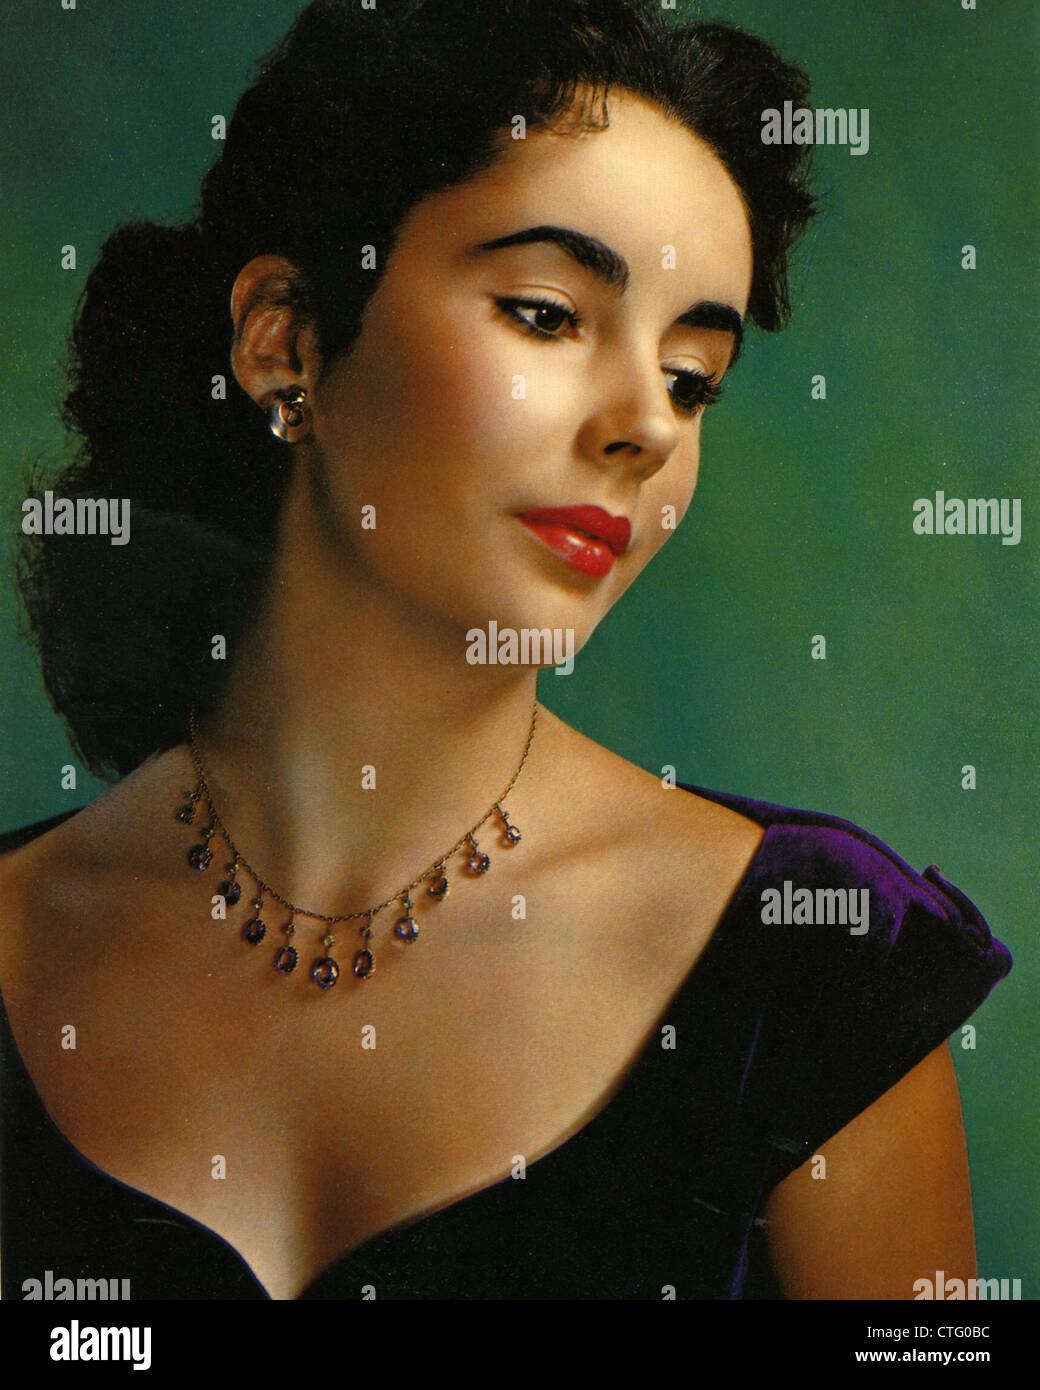 ELIZABETH TAYLOR (1932-2011) Actrice américaine vers 1950 Photo Stock